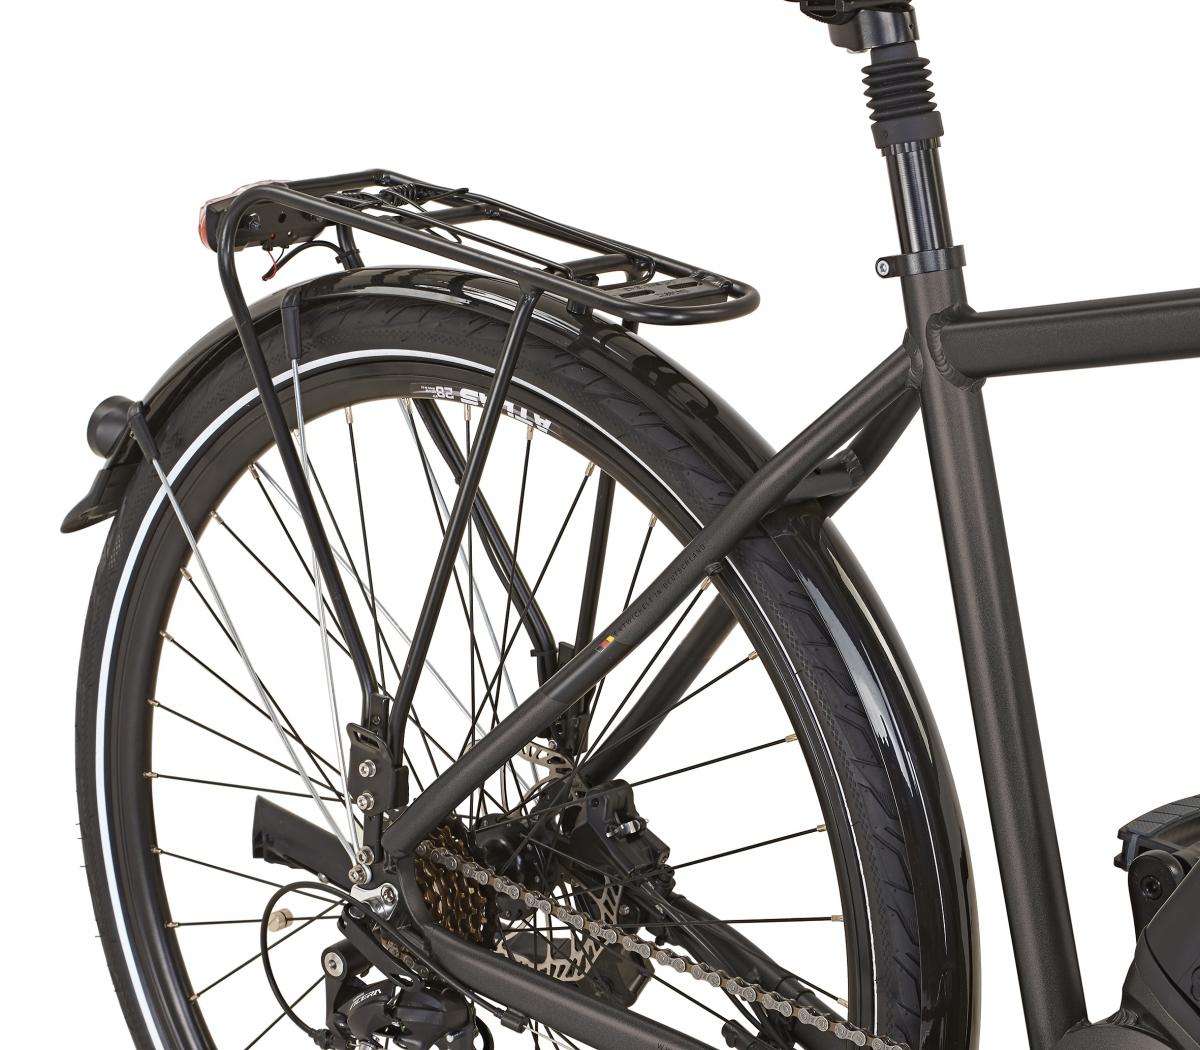 prophete e bike alu trekking 28 aeg entdecker e8 7 damen ihr fahrrad online shop bei. Black Bedroom Furniture Sets. Home Design Ideas